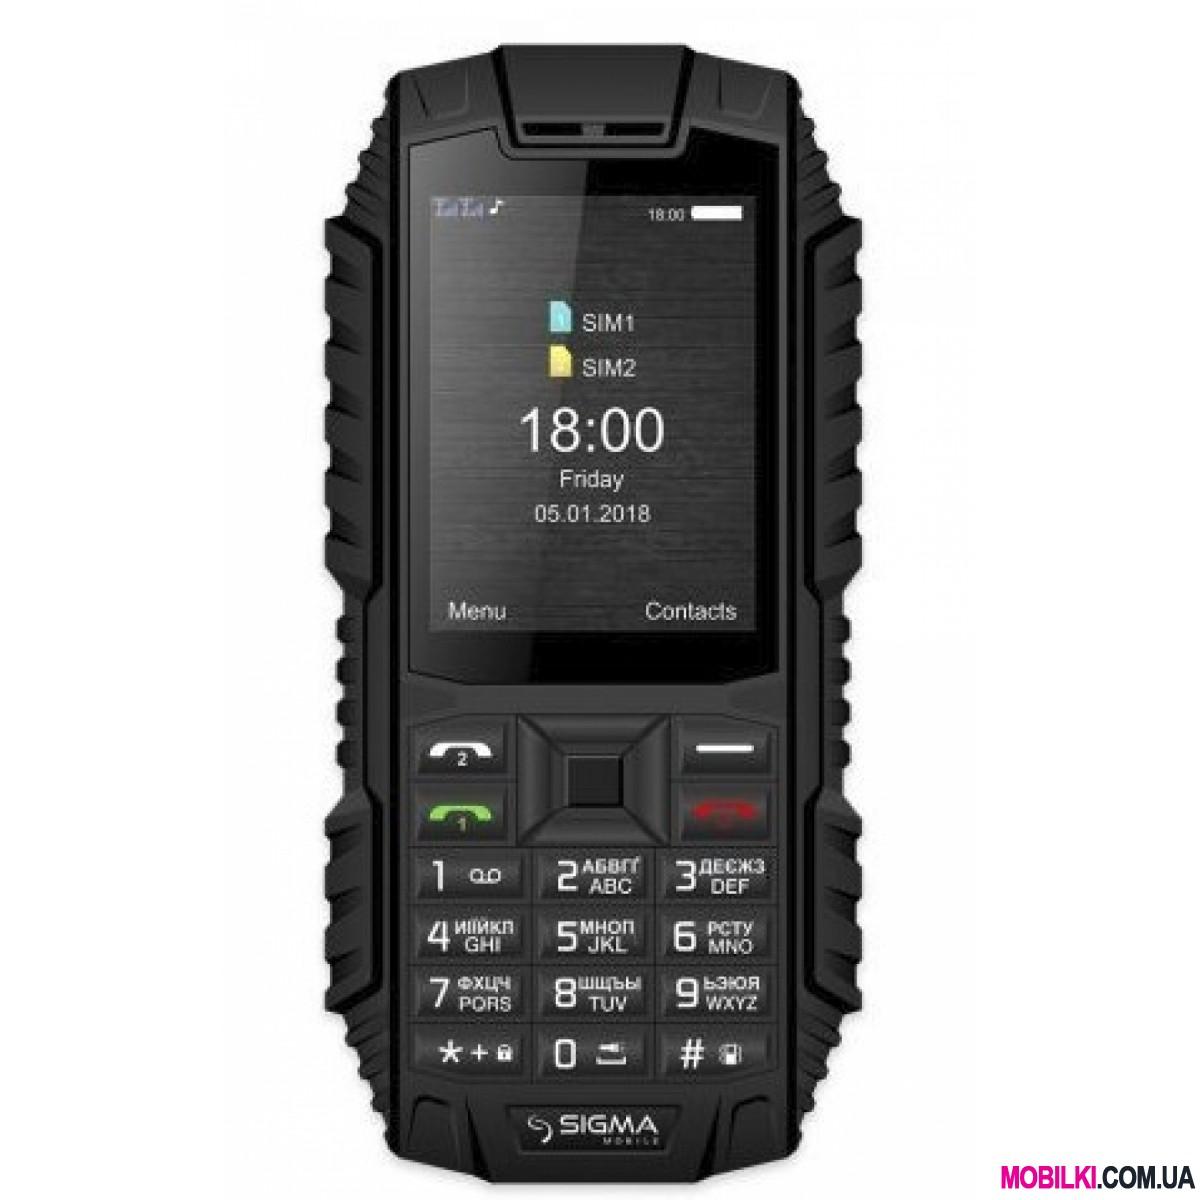 Sigma mobile X-treme DT68